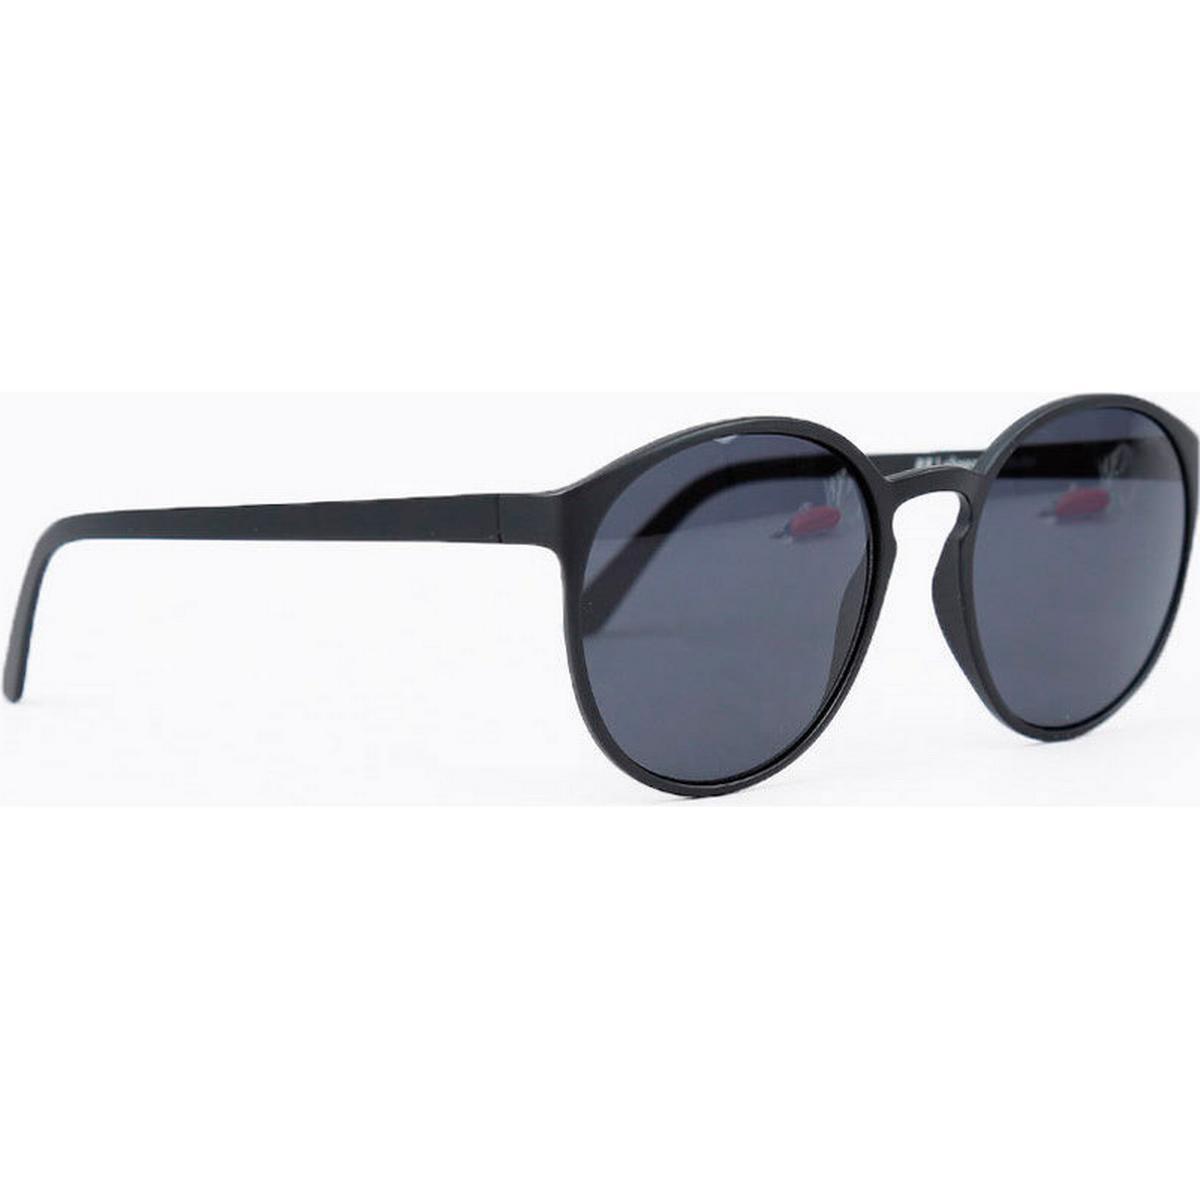 Le specs swizzle • Hitta det lägsta priset hos PriceRunner nu »